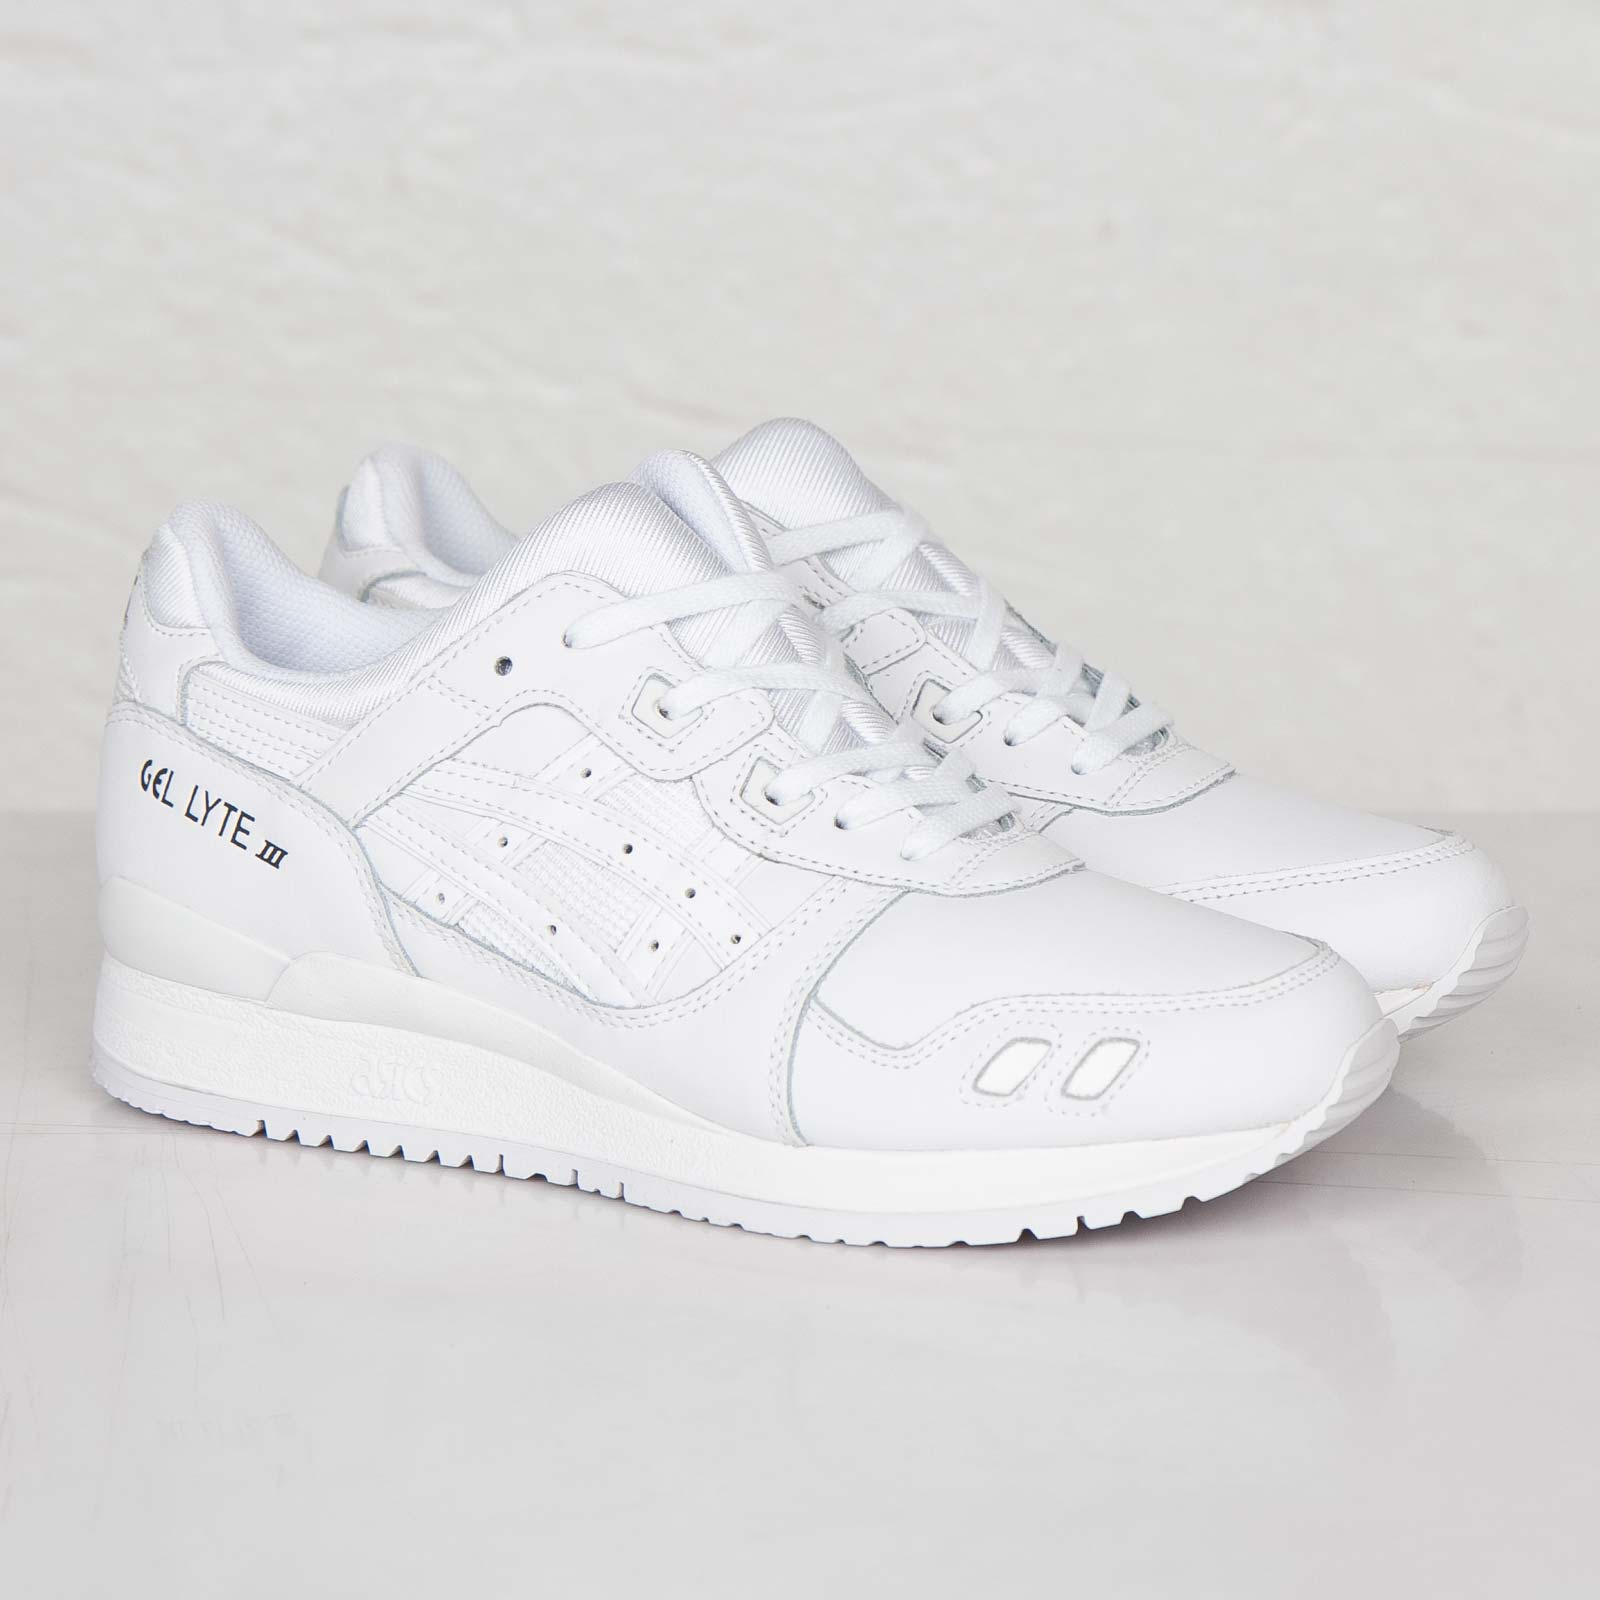 buy online c02da c31f6 ASICS Tiger Gel-Lyte III - H534l-0101 - Sneakersnstuff ...